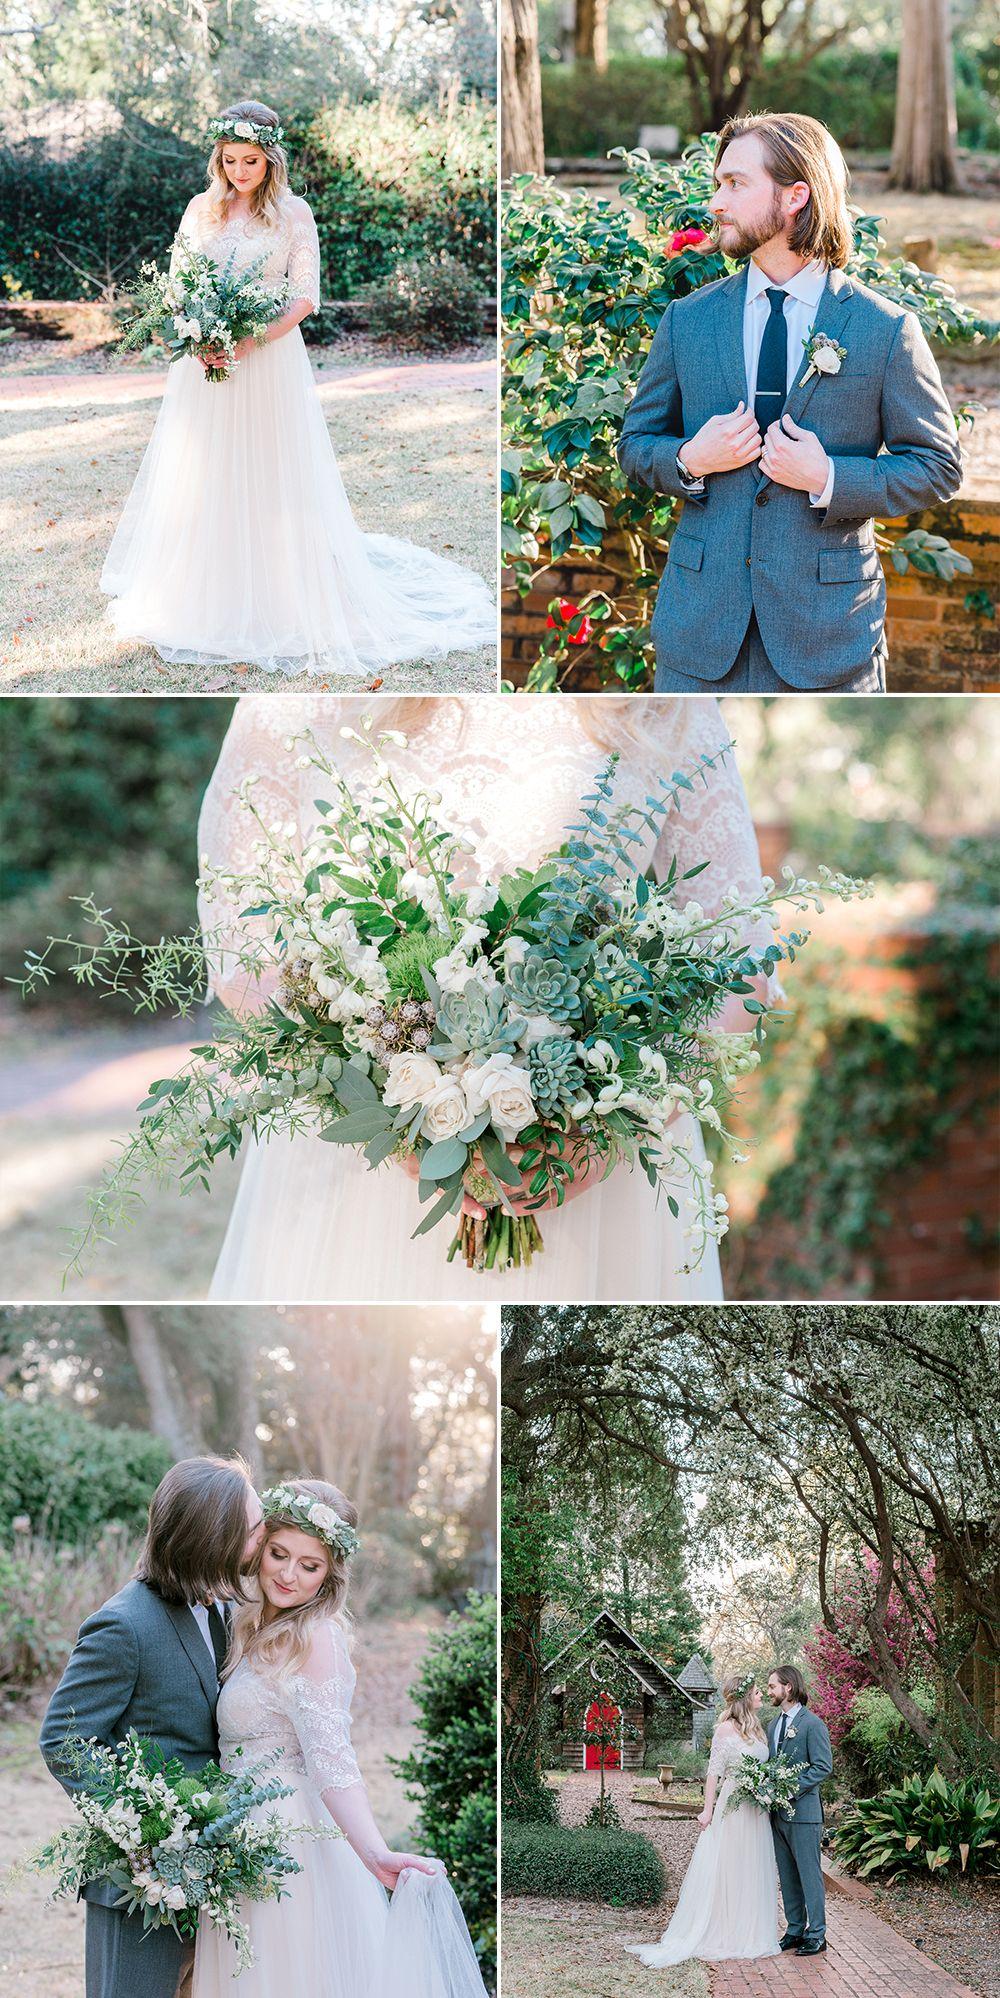 Wedding At Rose Hill Estates In Aiken Sc Whimsical Wedding In South Carolina Succulent Wedding Bou Styled Wedding Shooting Succulent Bouquet Wedding Wedding [ 1998 x 1000 Pixel ]